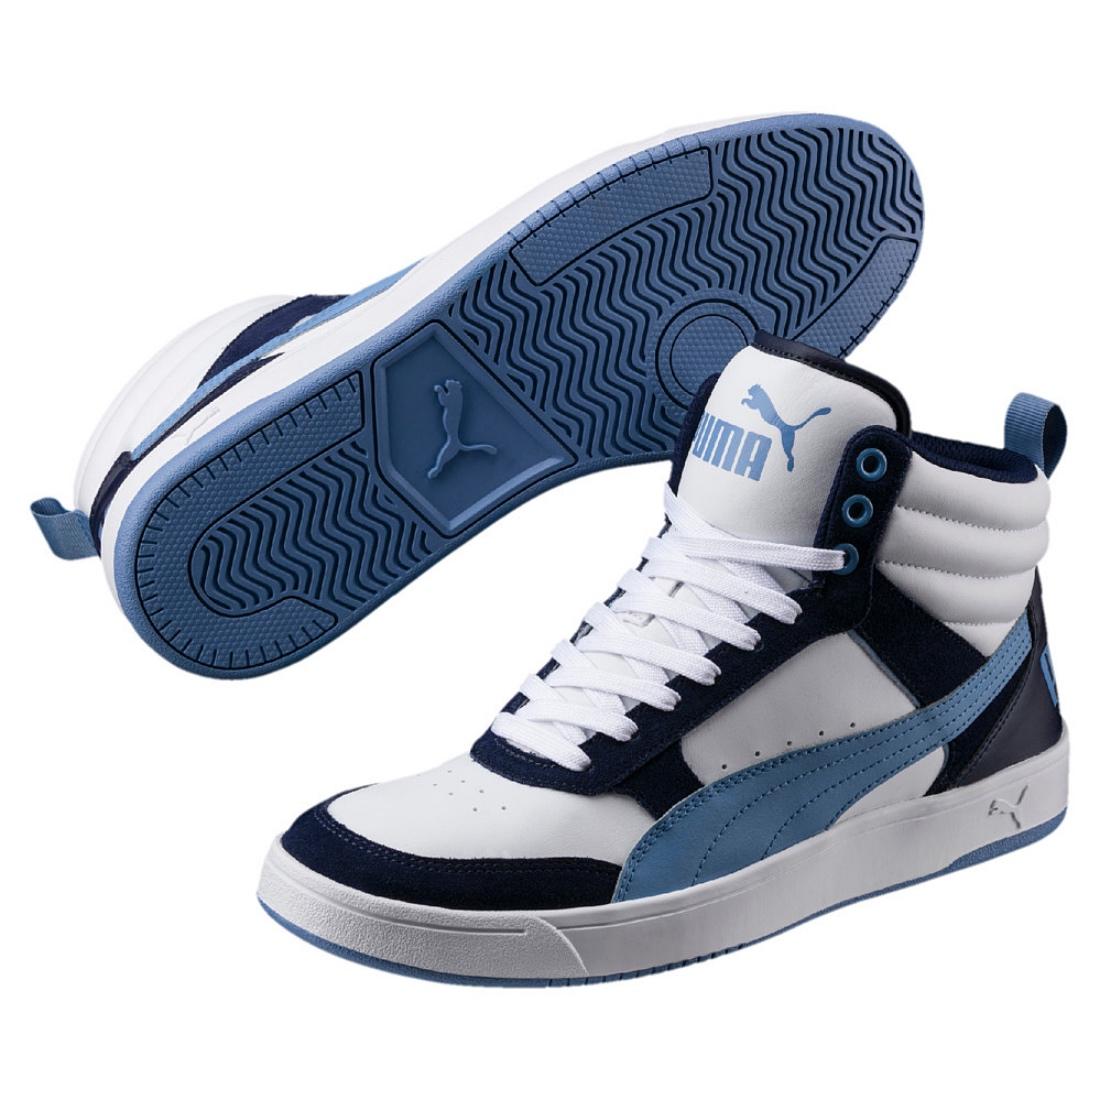 PUMA Rebound Street v2 Mid Scarpe Sneaker 363715 PUMA WHITE ALLURE Peacoat